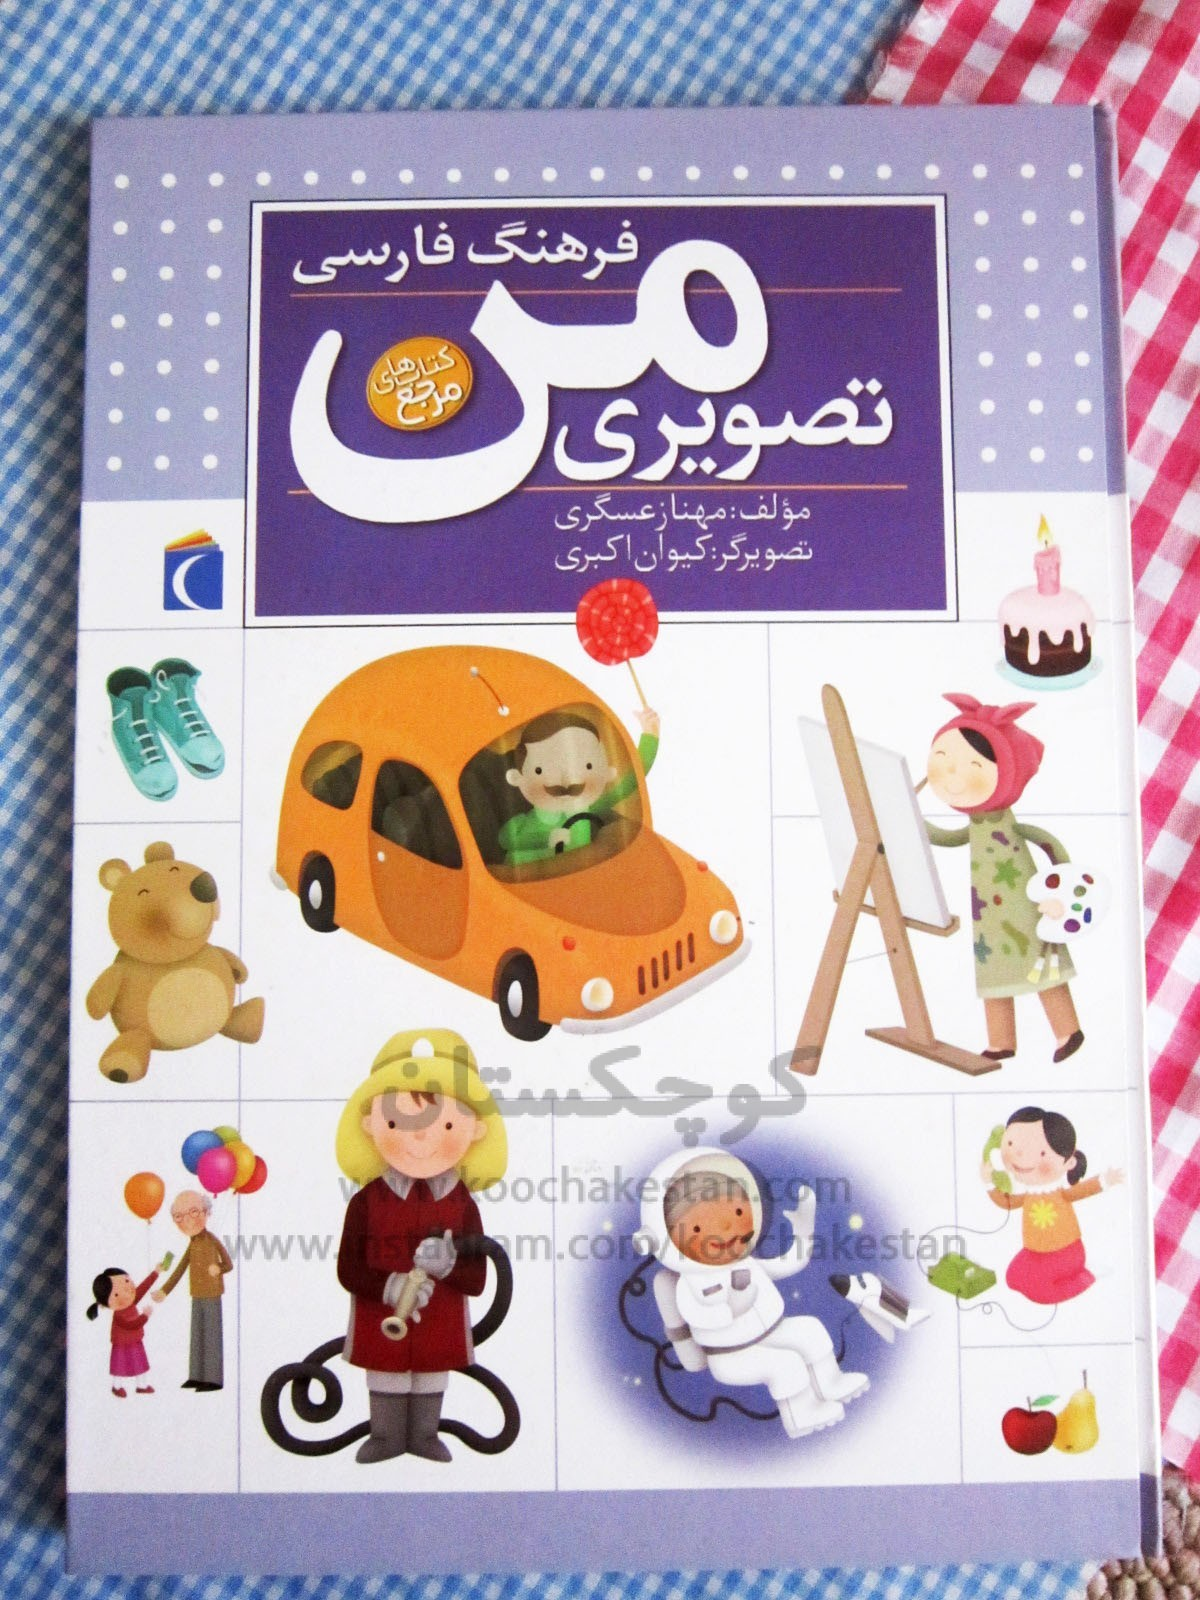 فرهنگ فارسی تصویری من - کتابخانه کودک